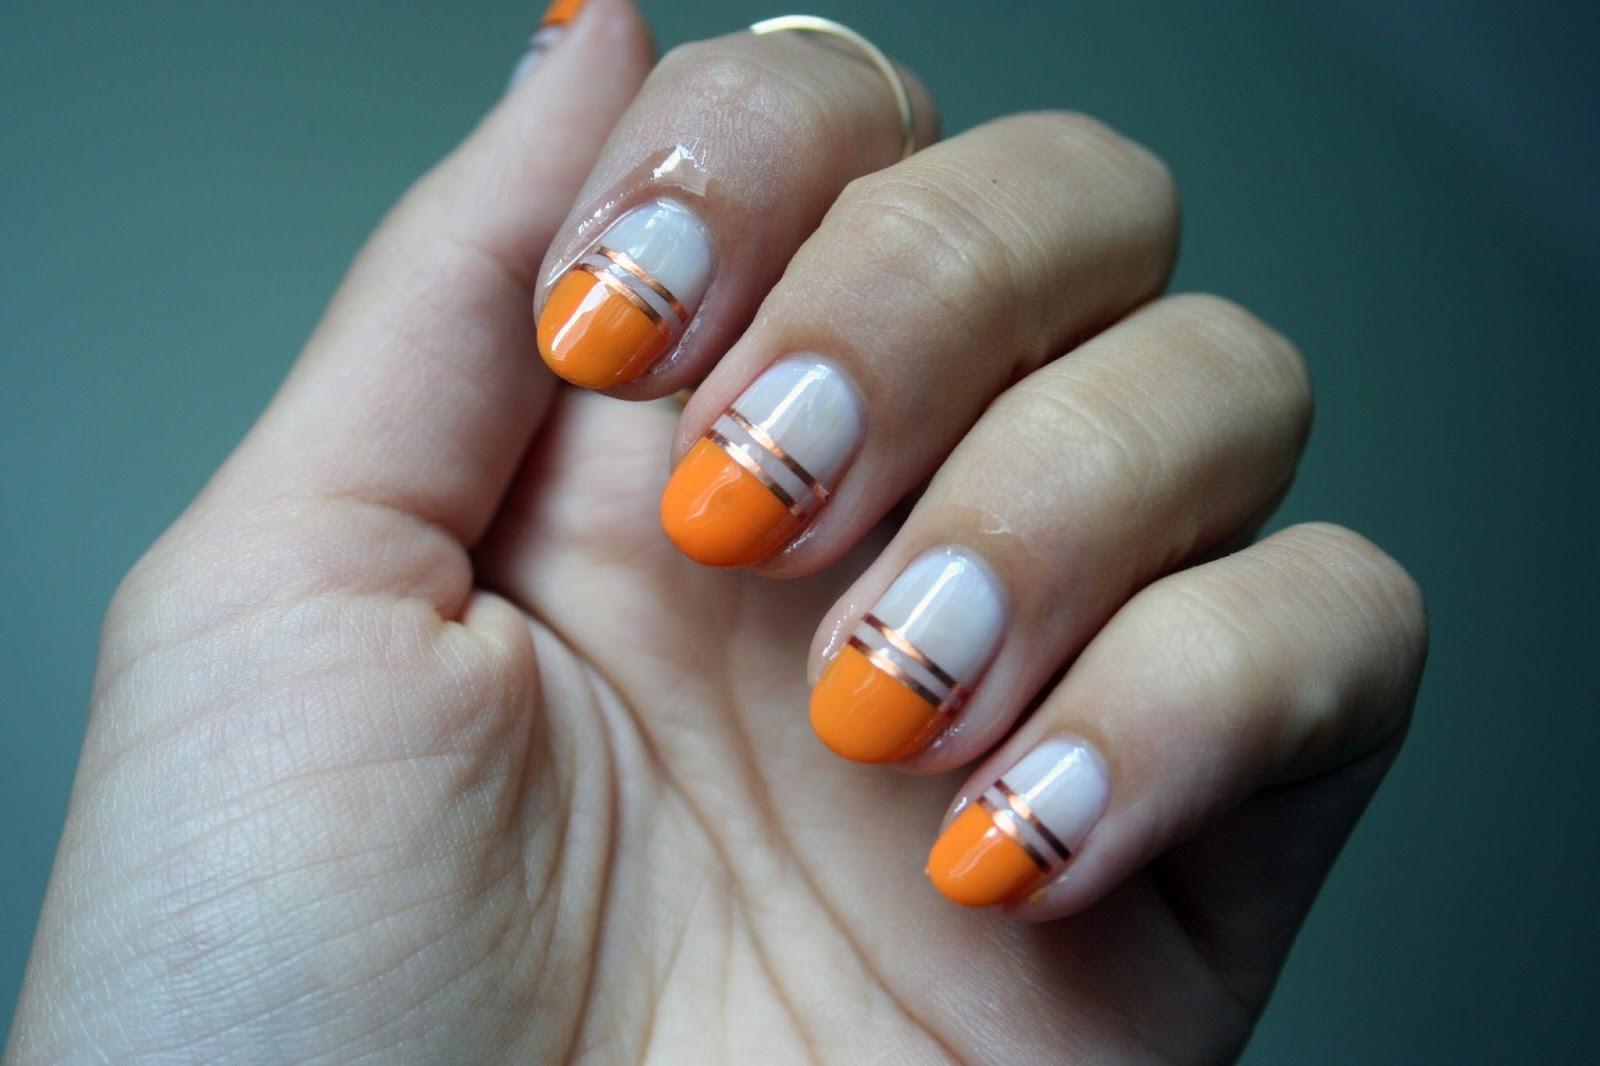 Orange And White With Metallic Stamping Tape Nail Art